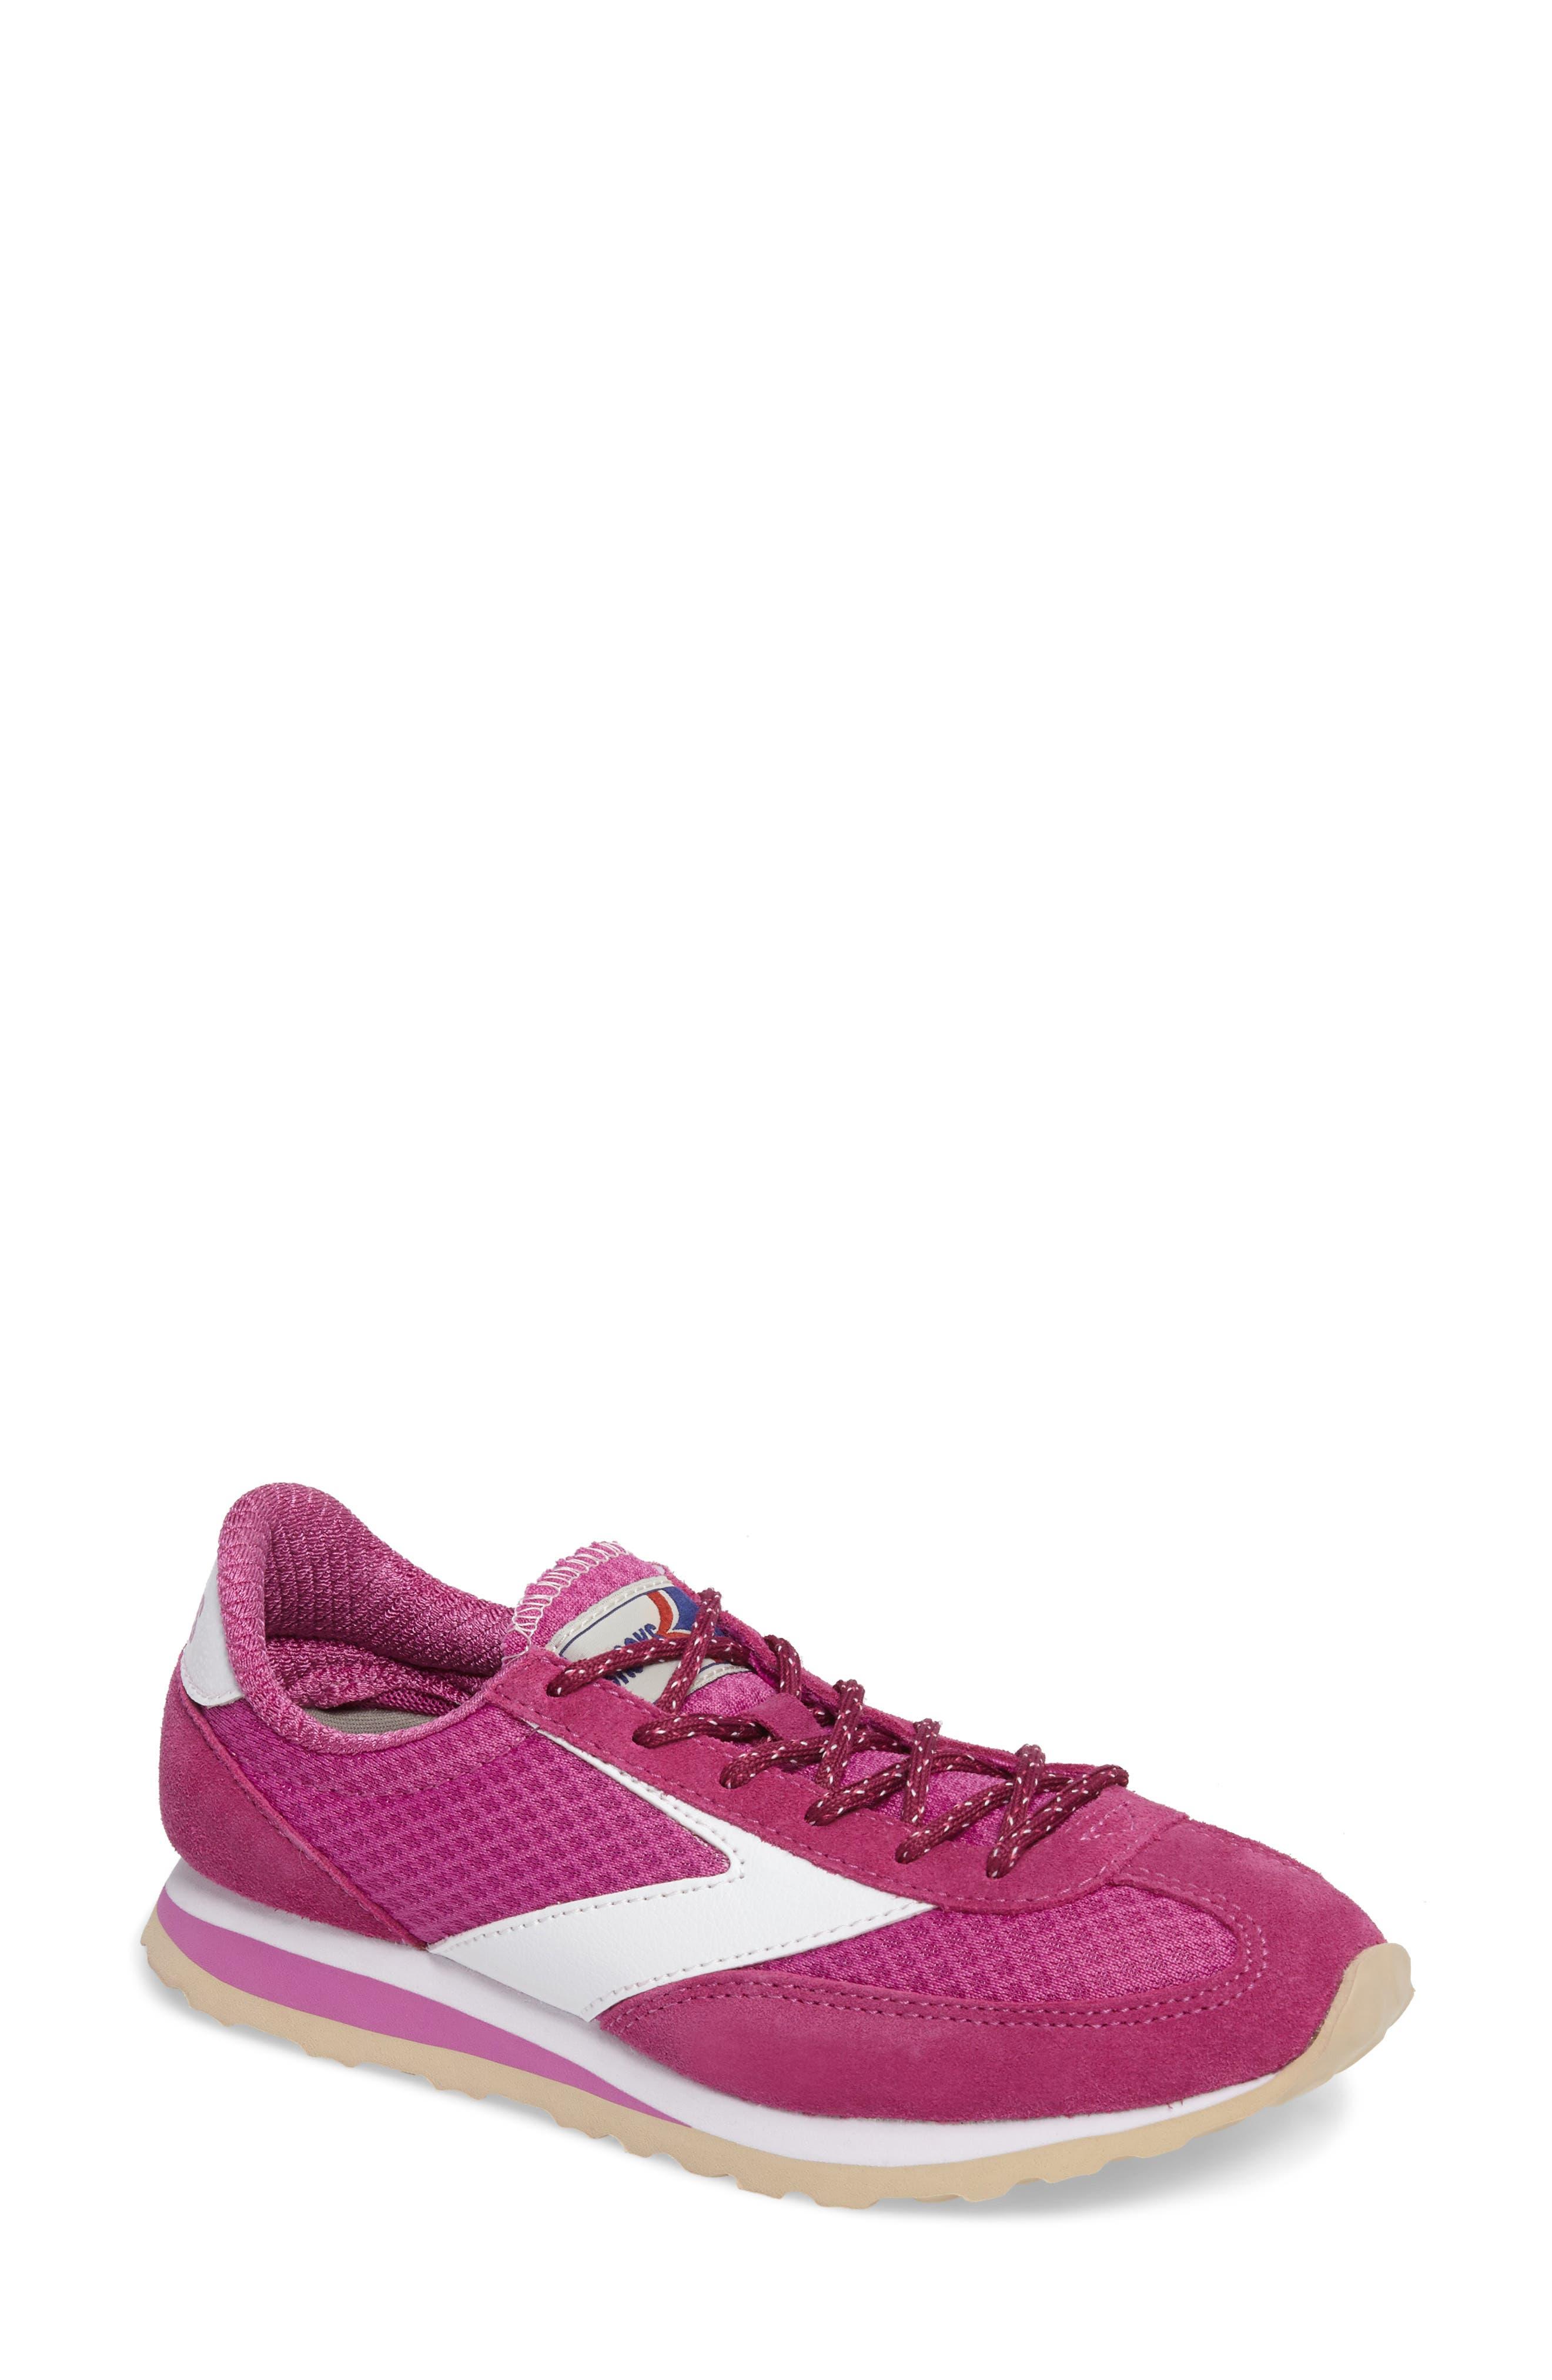 Alternate Image 1 Selected - Brooks 'Vanguard' Sneaker (Women)